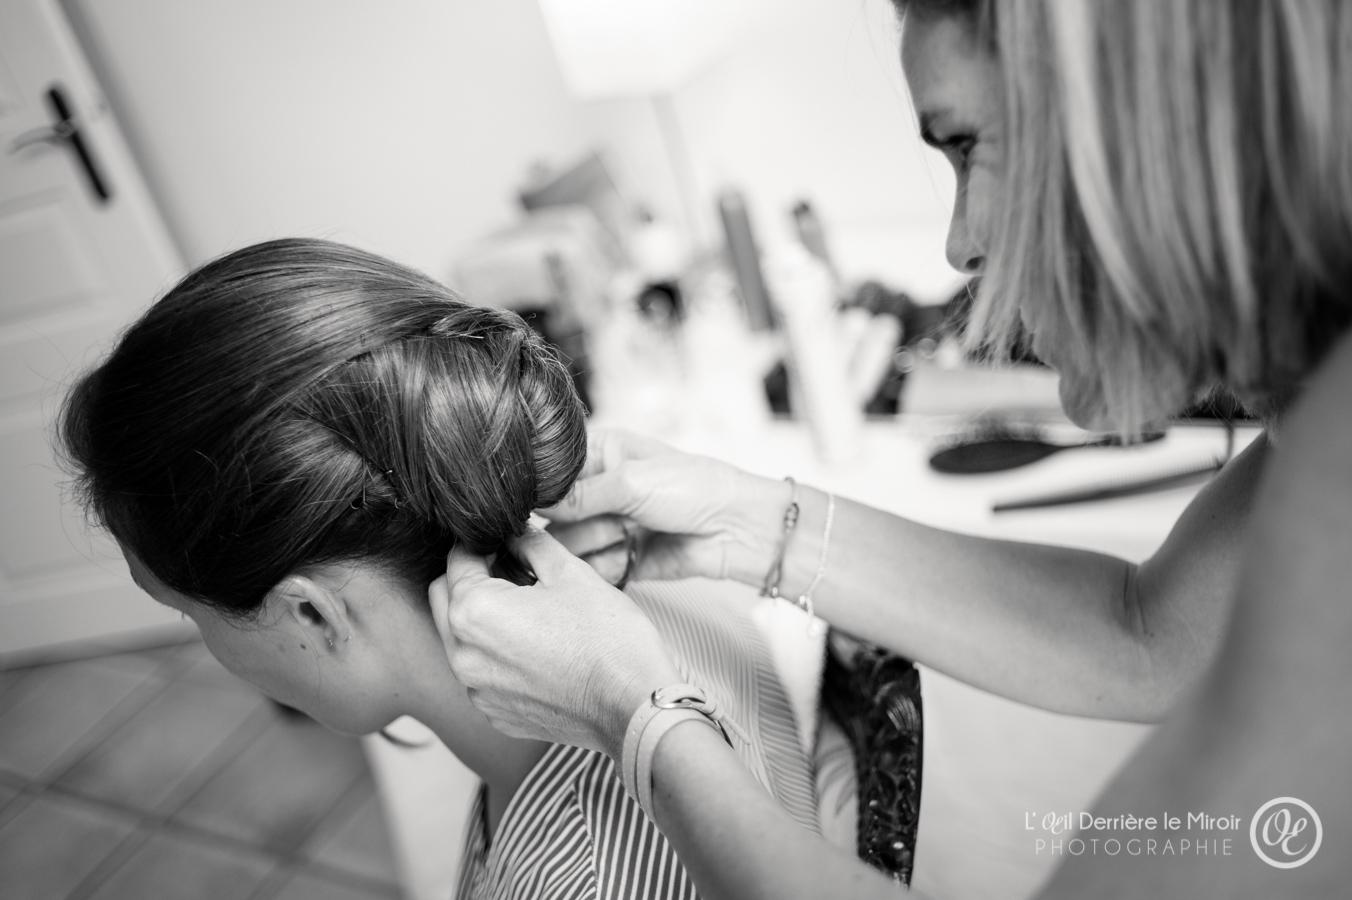 Photographe-Mariage-grasse-loeilderrierelemiroir-jt-012